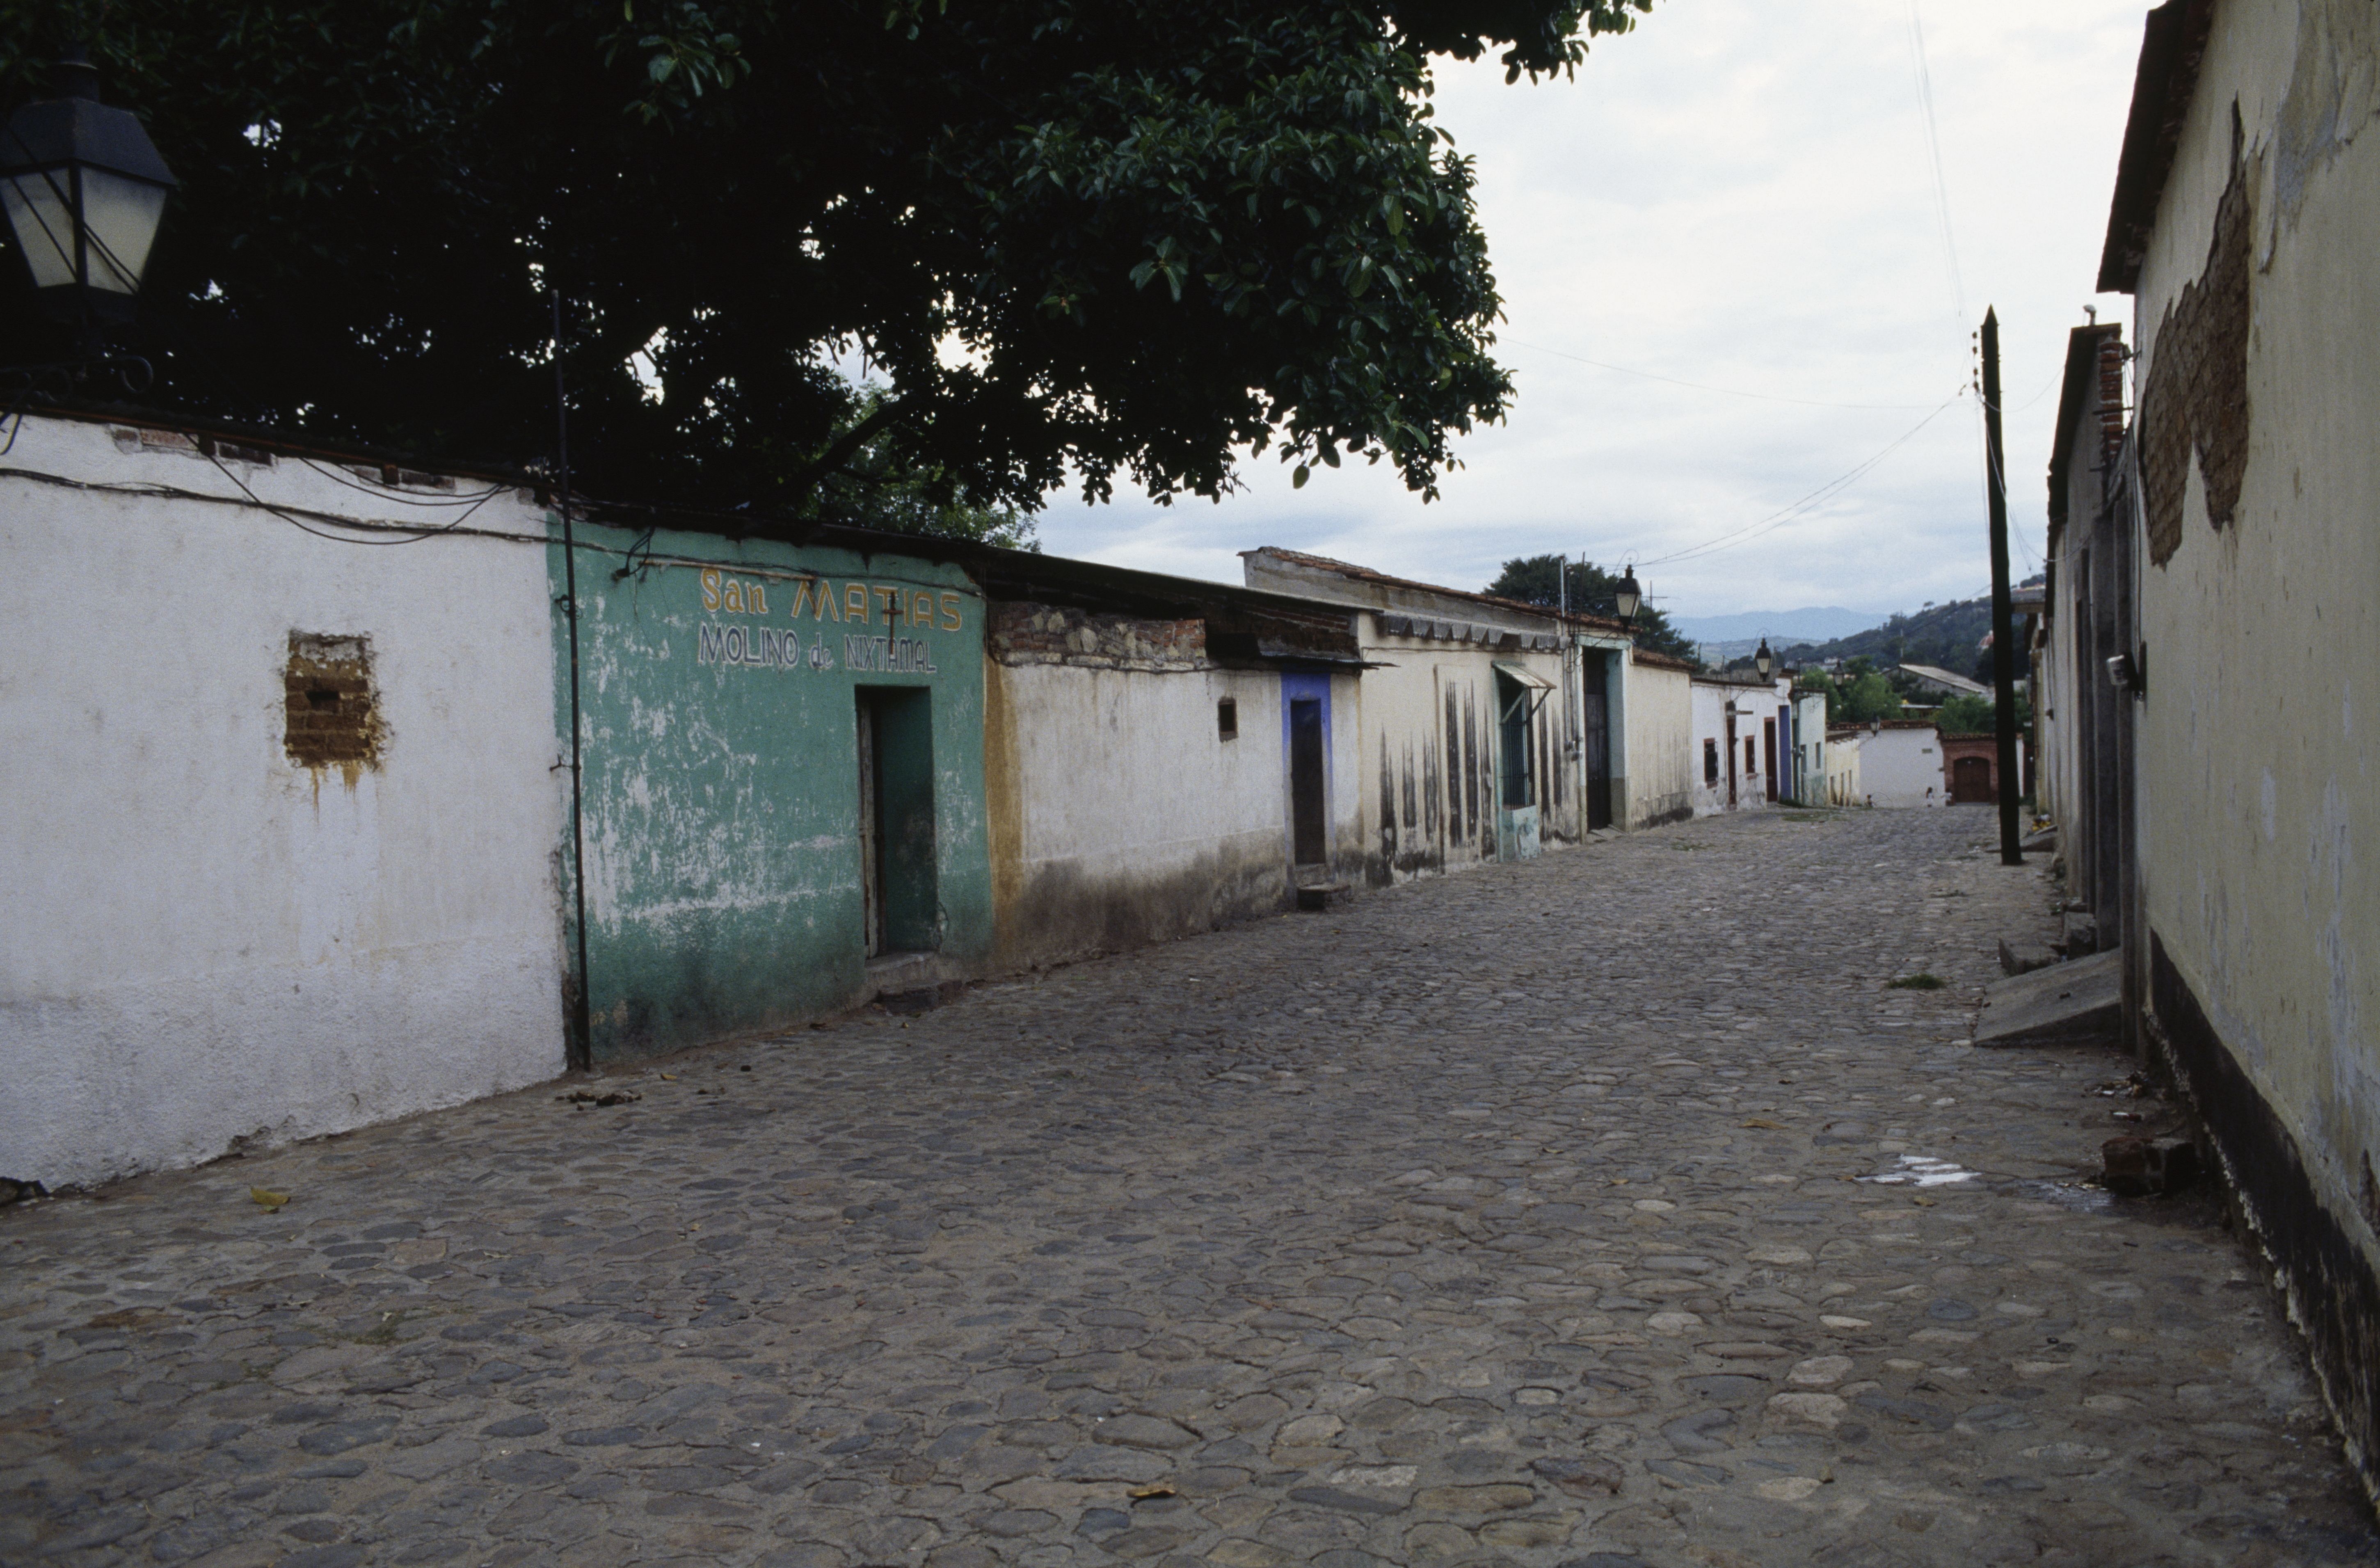 A street on outskirts of Oaxaca de Juarez